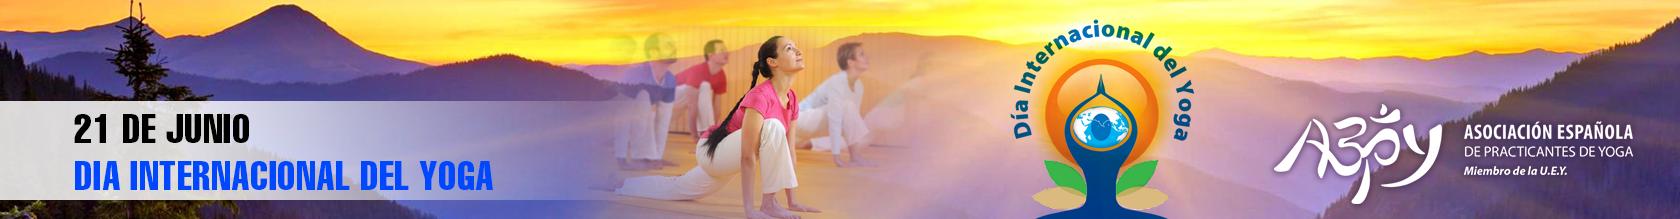 Sliders-dia-del-yoga-AEPY-2019